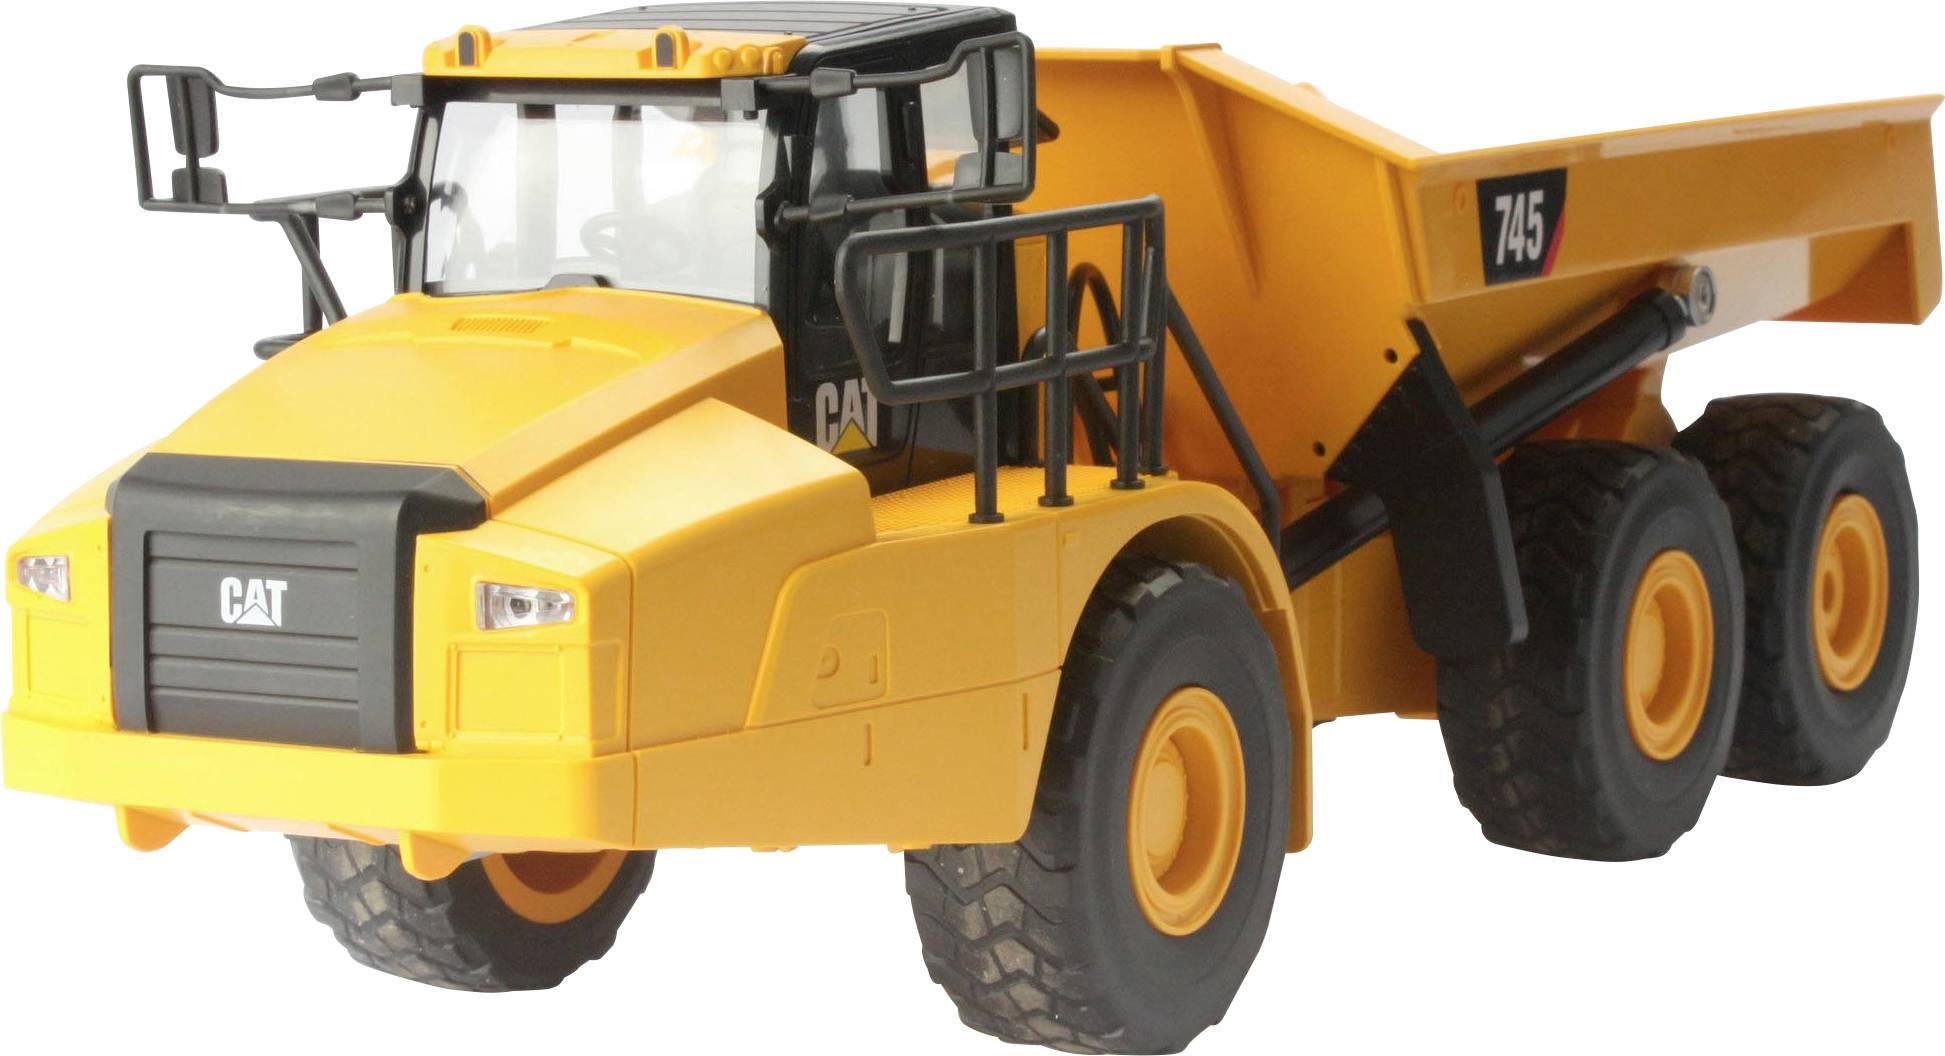 Diecast Masters 25004 Cat® Knickgelenk Dumper 1:24  rc funkcijski model